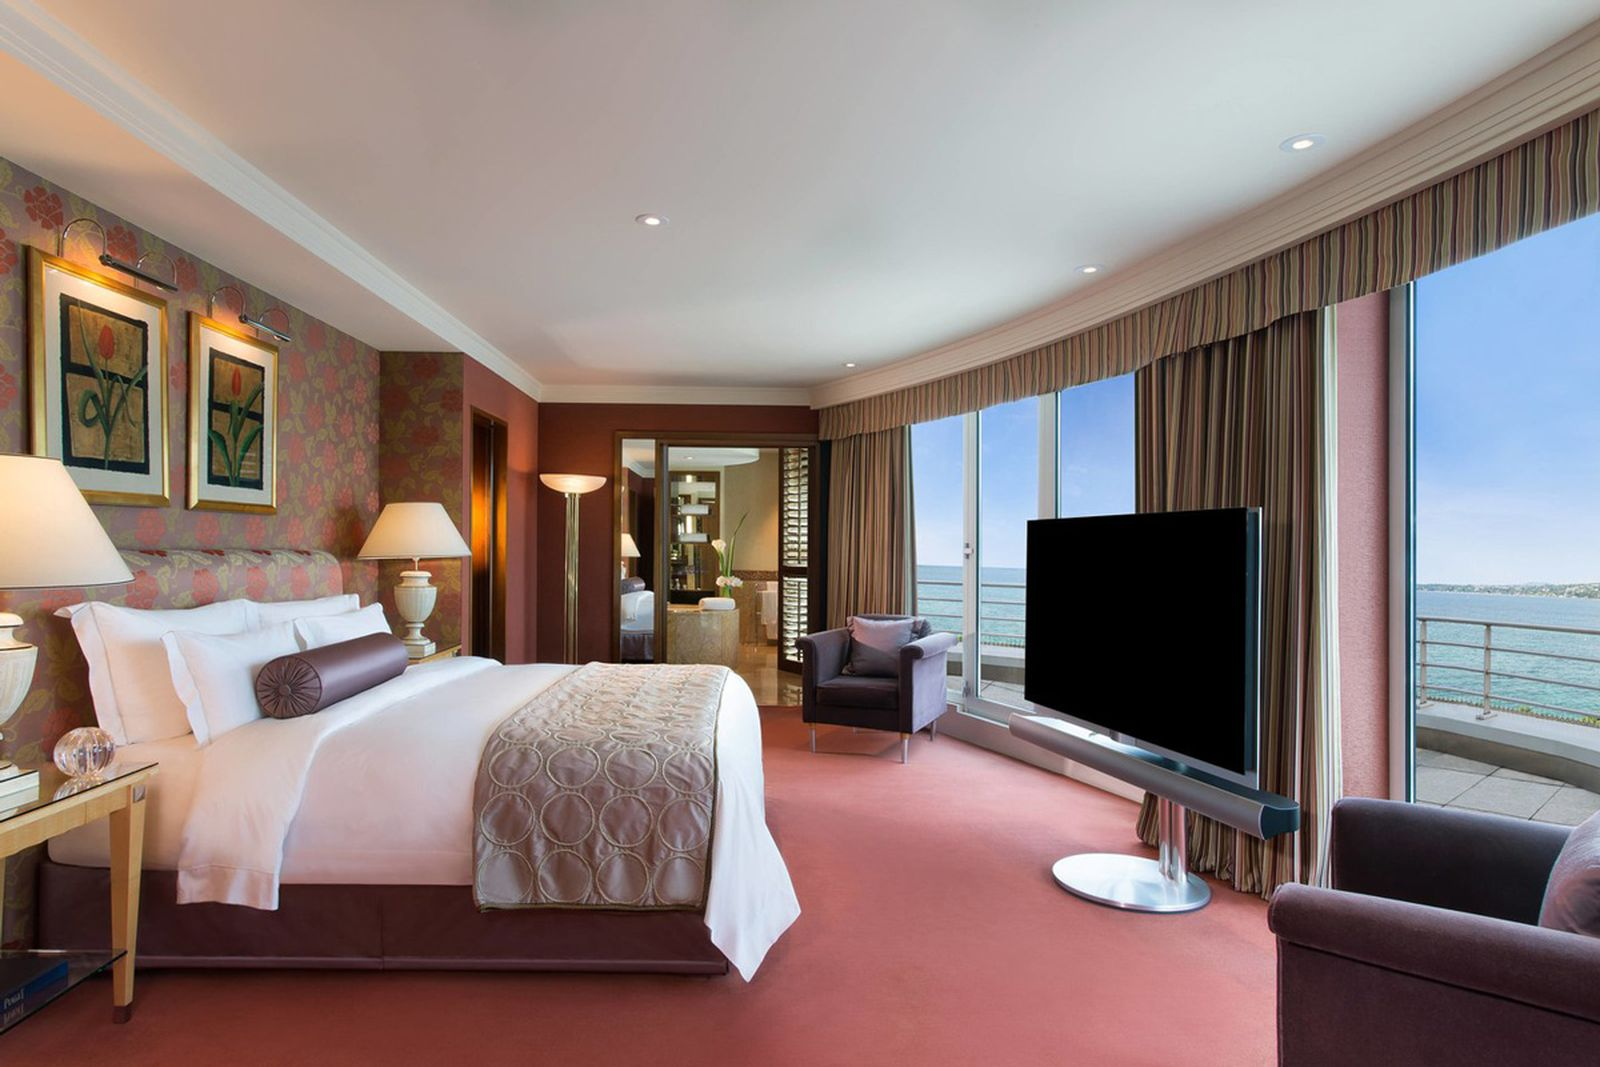 hotel president wilson hotels plaza hotel the palms